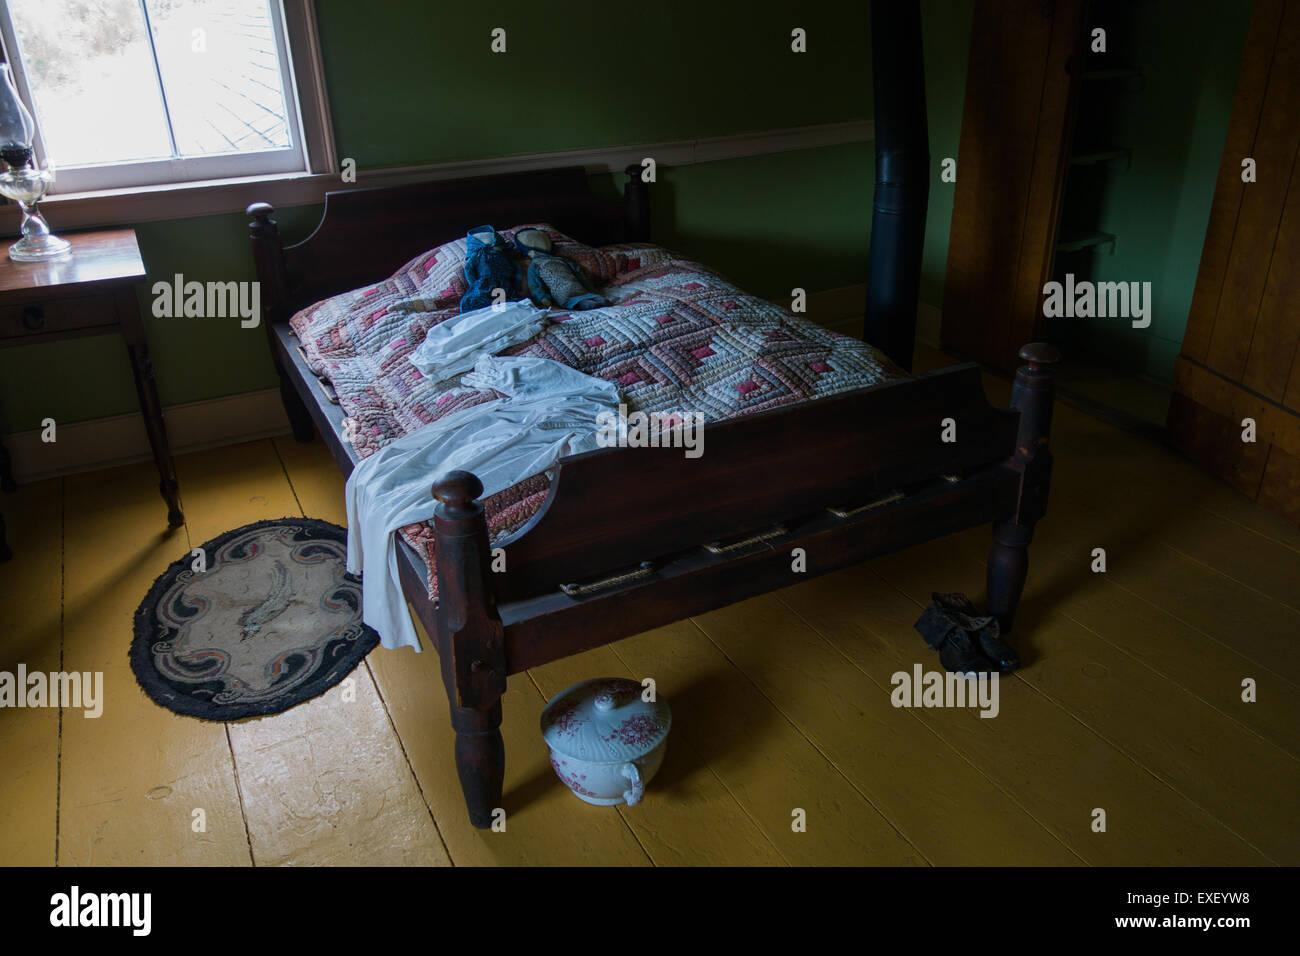 Mennonite Furniture Kitchener Mennonite Bedroom Camber Pot Master Piss Pot Potty Vintage Stock